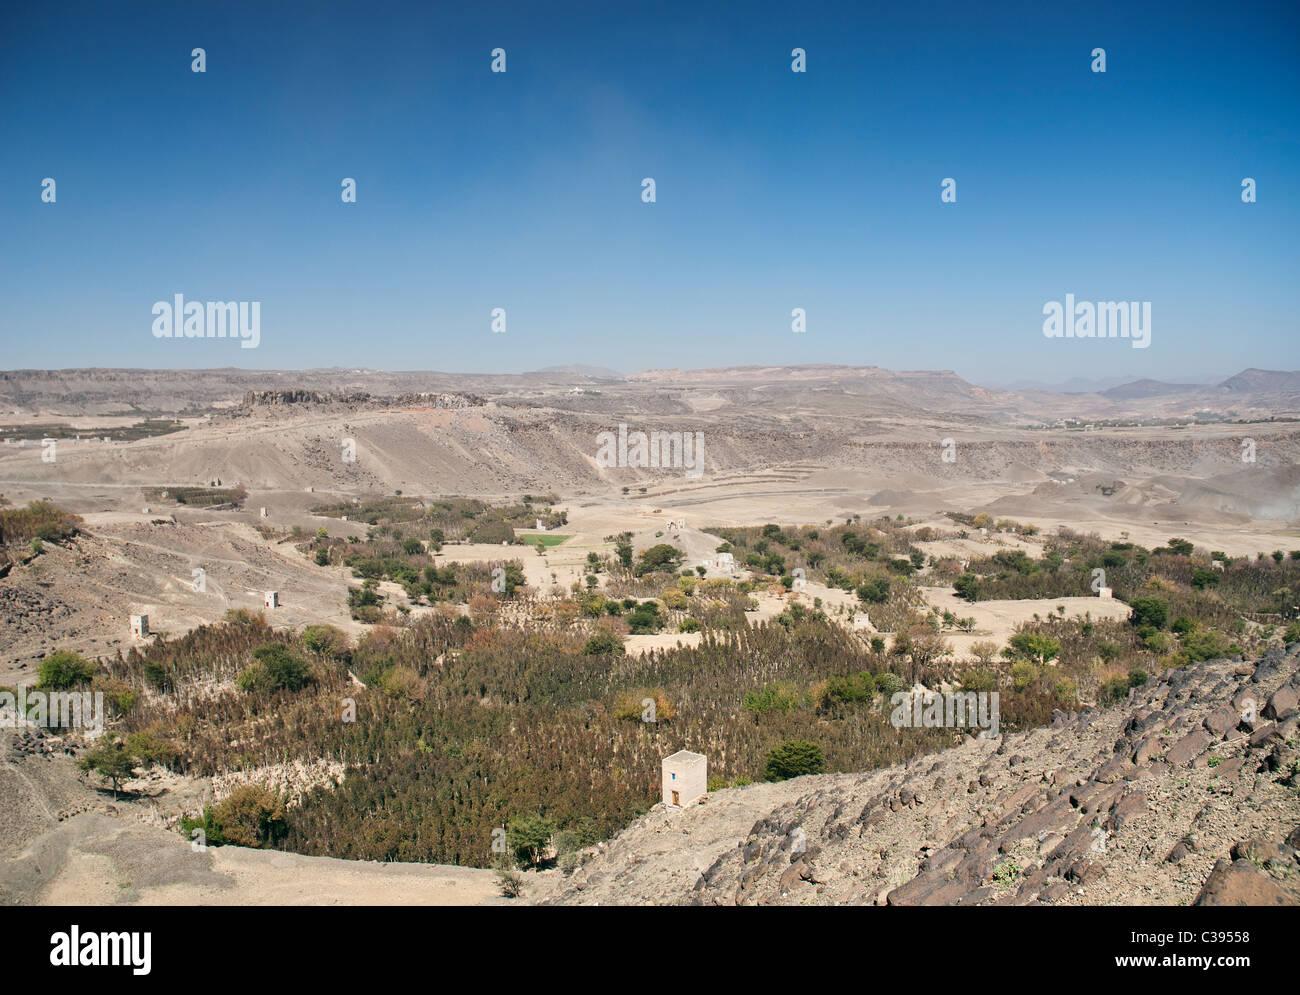 arid yemen landscape near sanaa with khat plantations - Stock Image